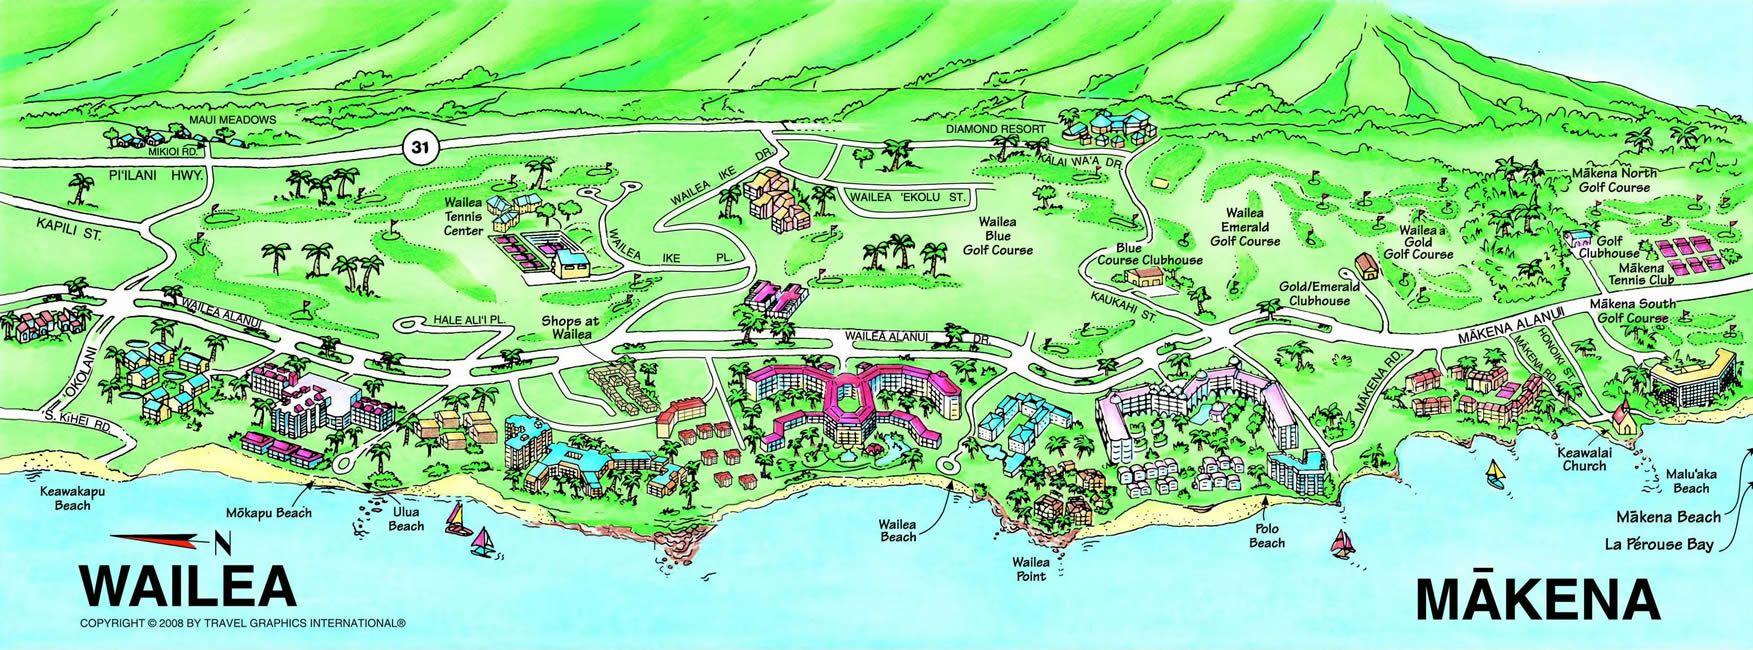 Wailea Beach Hotel Map The High Resolution Image Loads